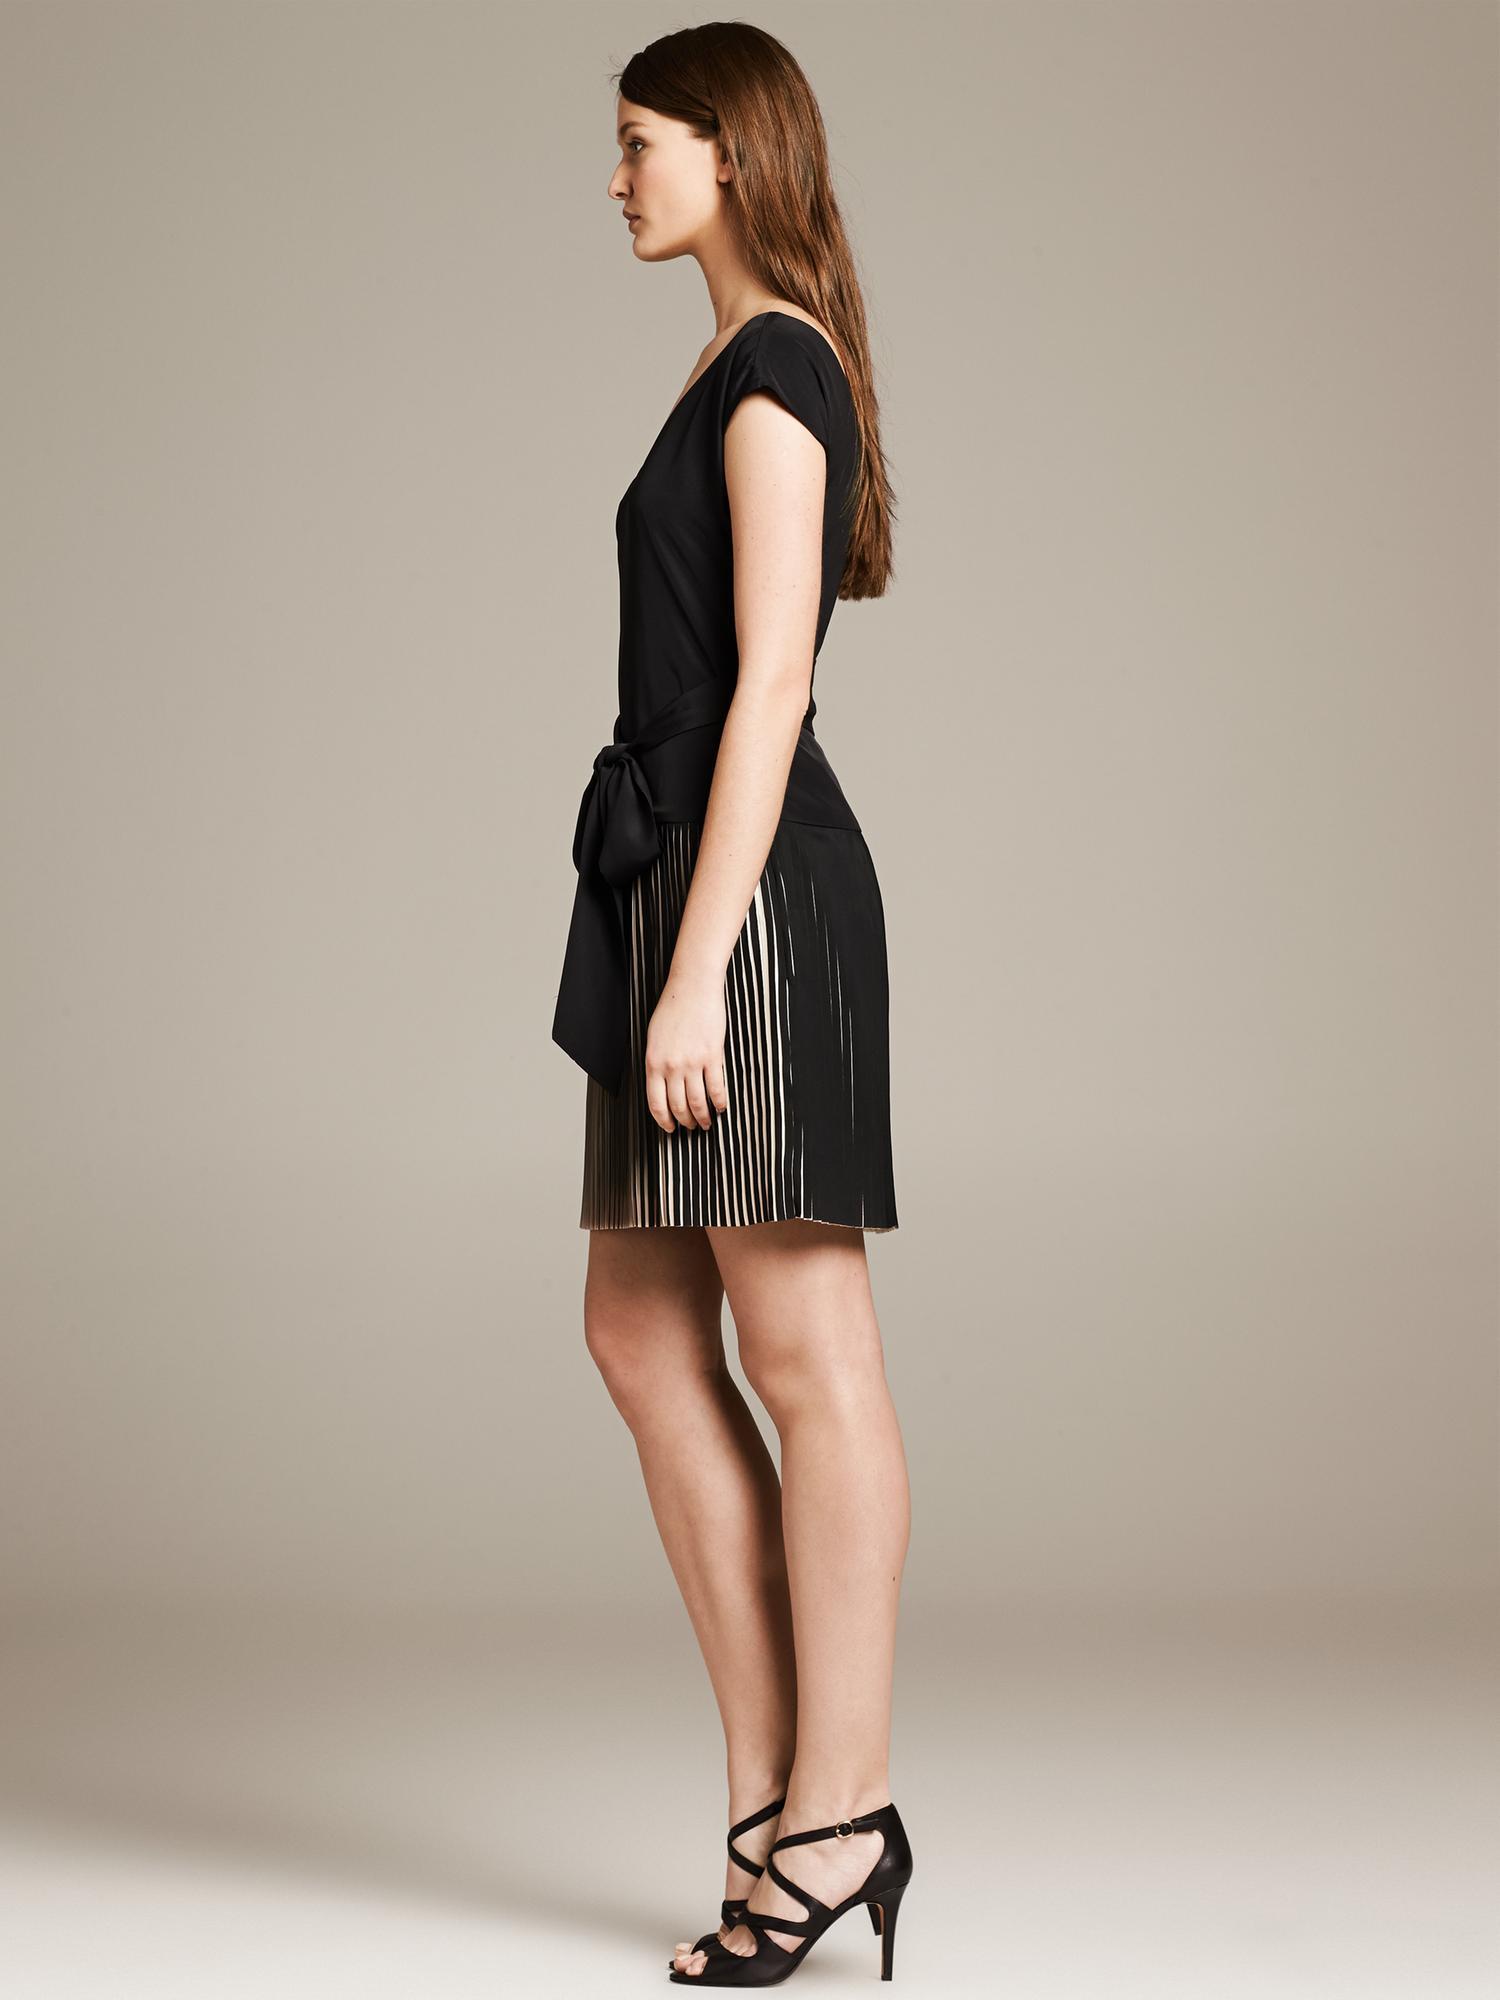 5930ab65364 Banana Republic Br Monogram Belted Pleat Dress in Black - Lyst